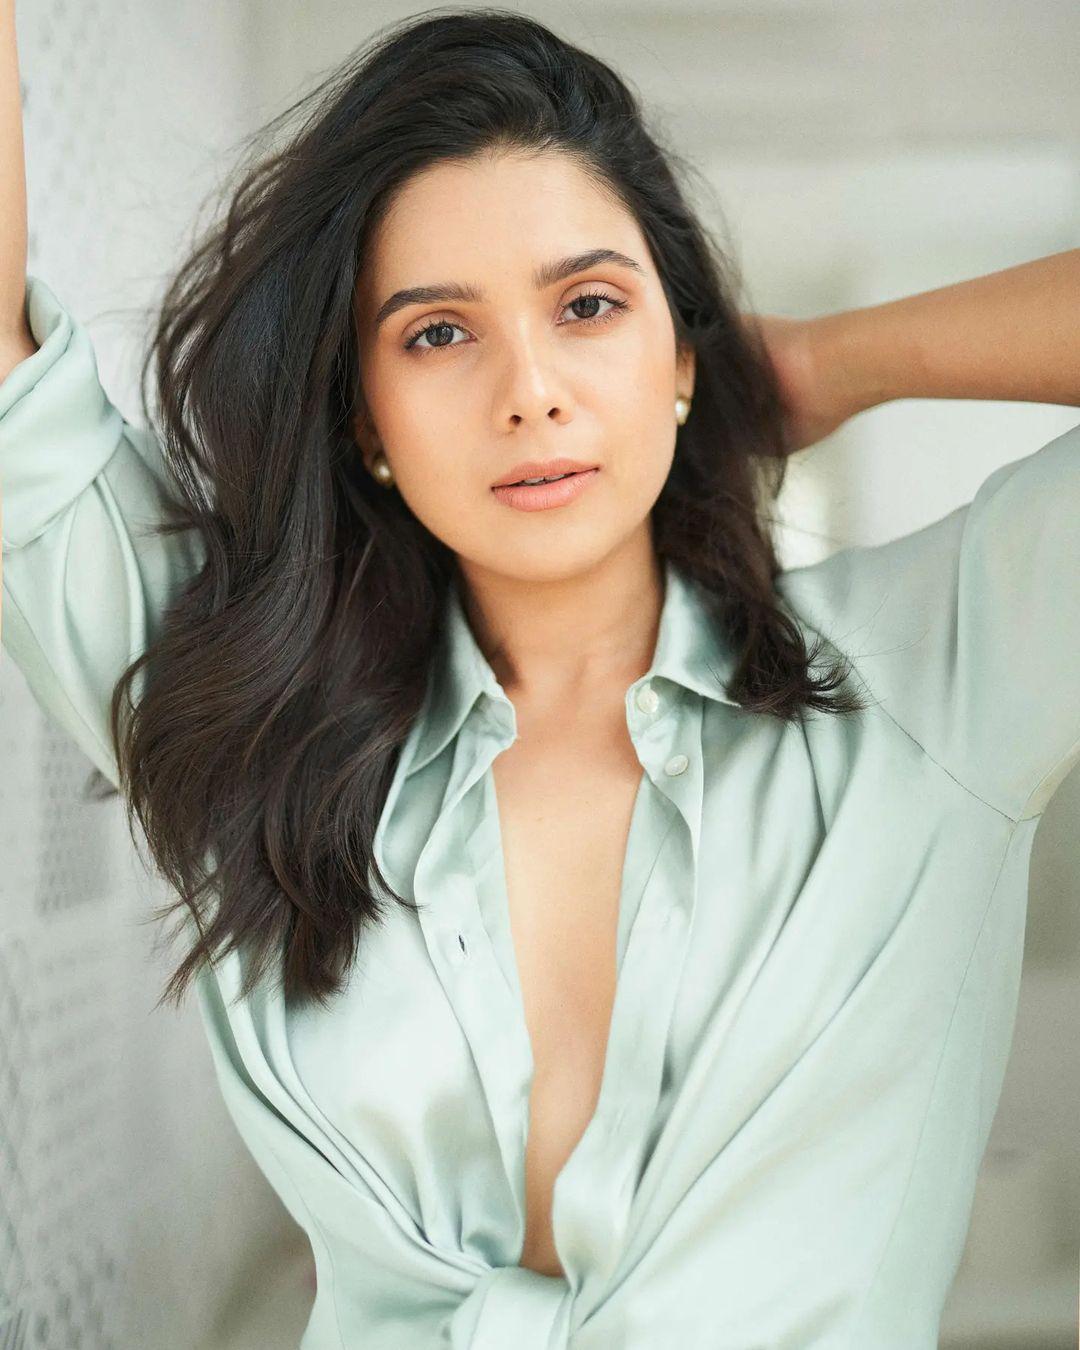 Rashmi-Agdekar-Hot-and-Erotic-Beautiful-Pictures-Insta-Stars